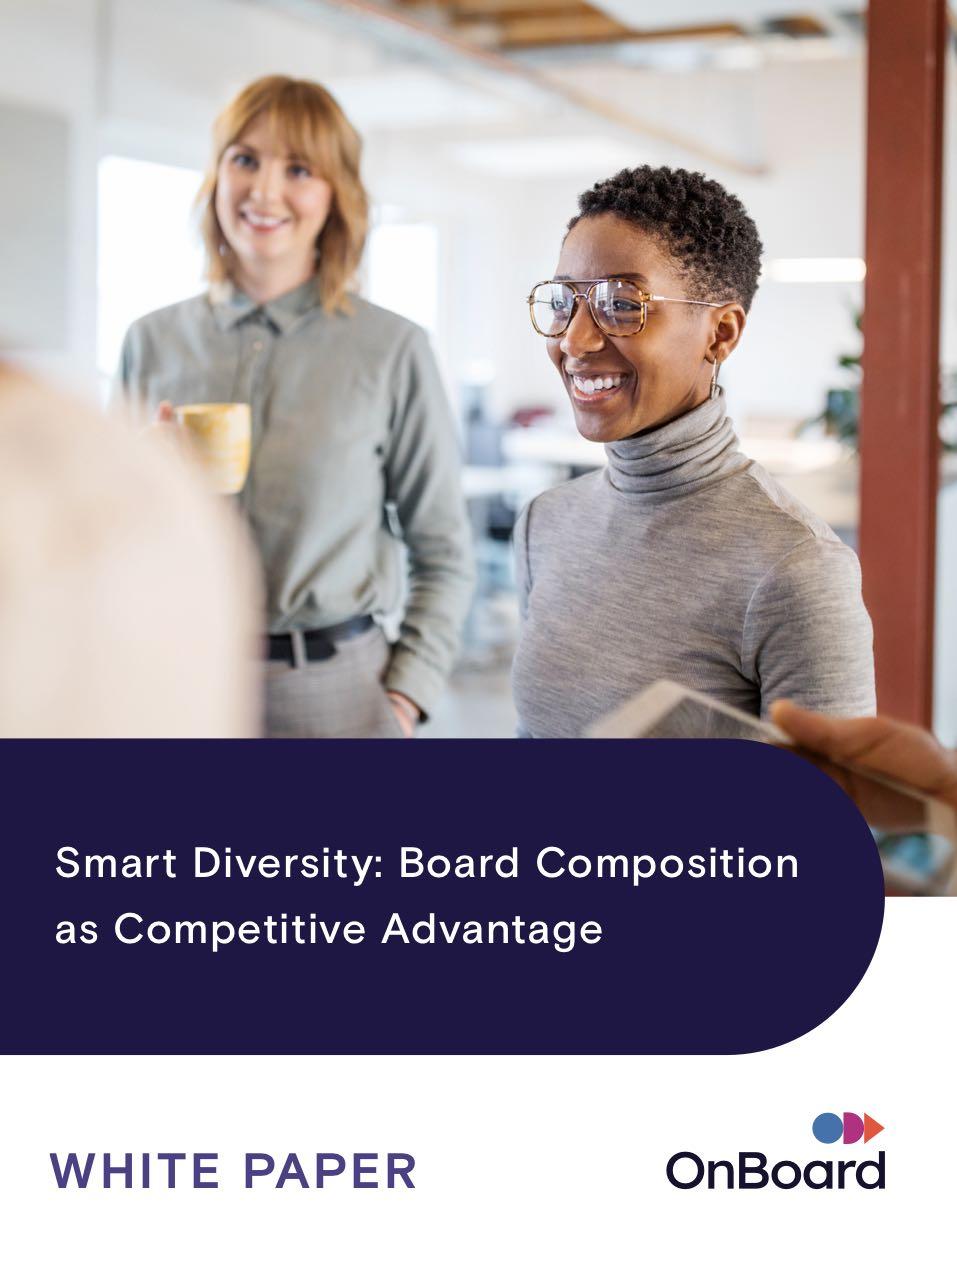 Smart Diversity & Board Composition